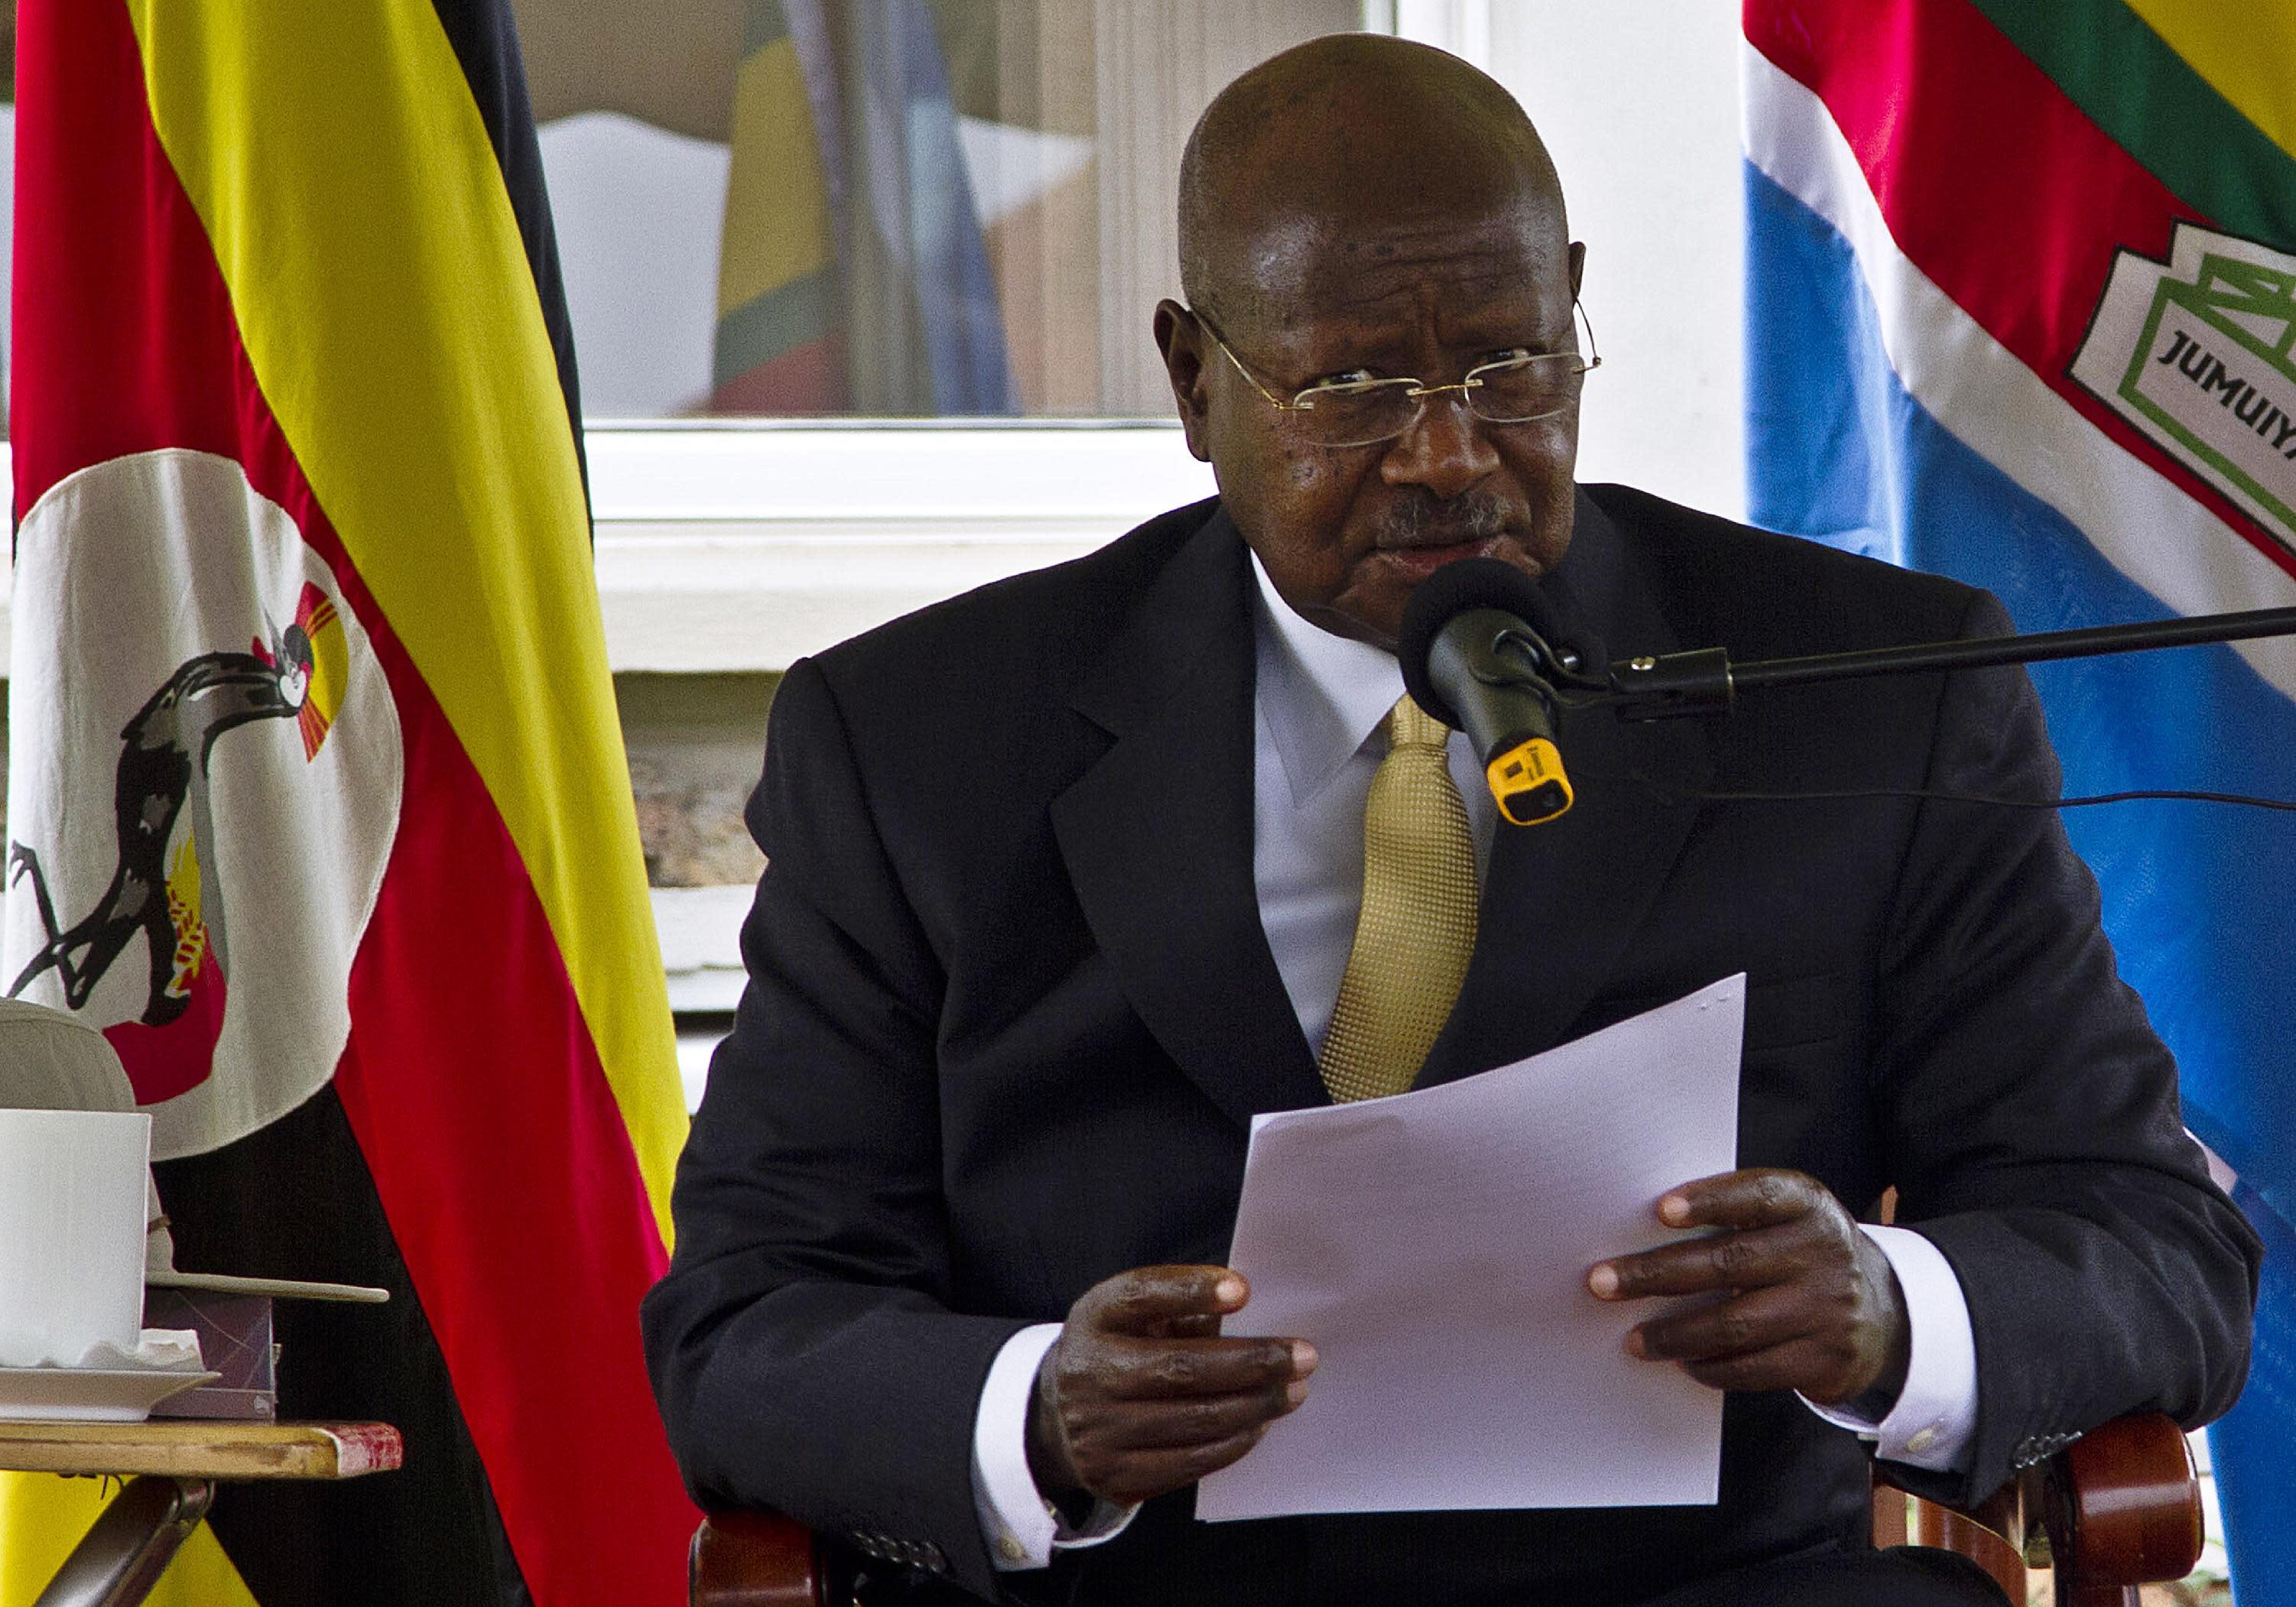 Uganda's veteran ruler Yoweri Museveni is standing for re-election on February 18, 2016